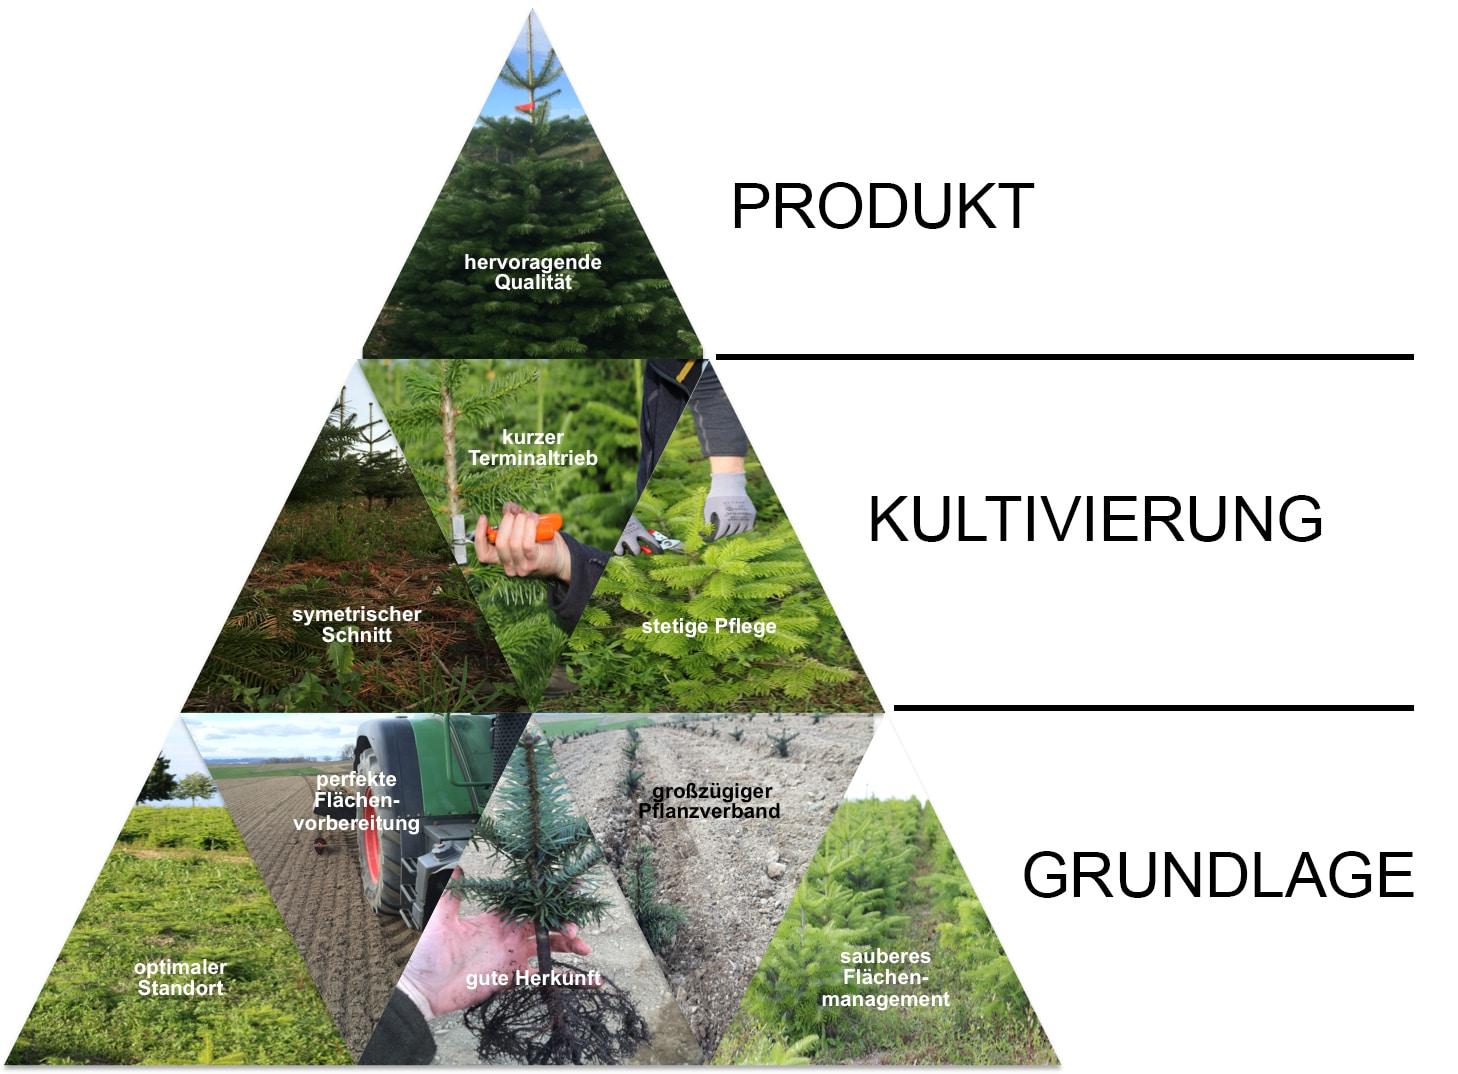 Produktionspyramide Nadelholzkulturen Osebold - Weihnachtsbäume aus dem Sauerland